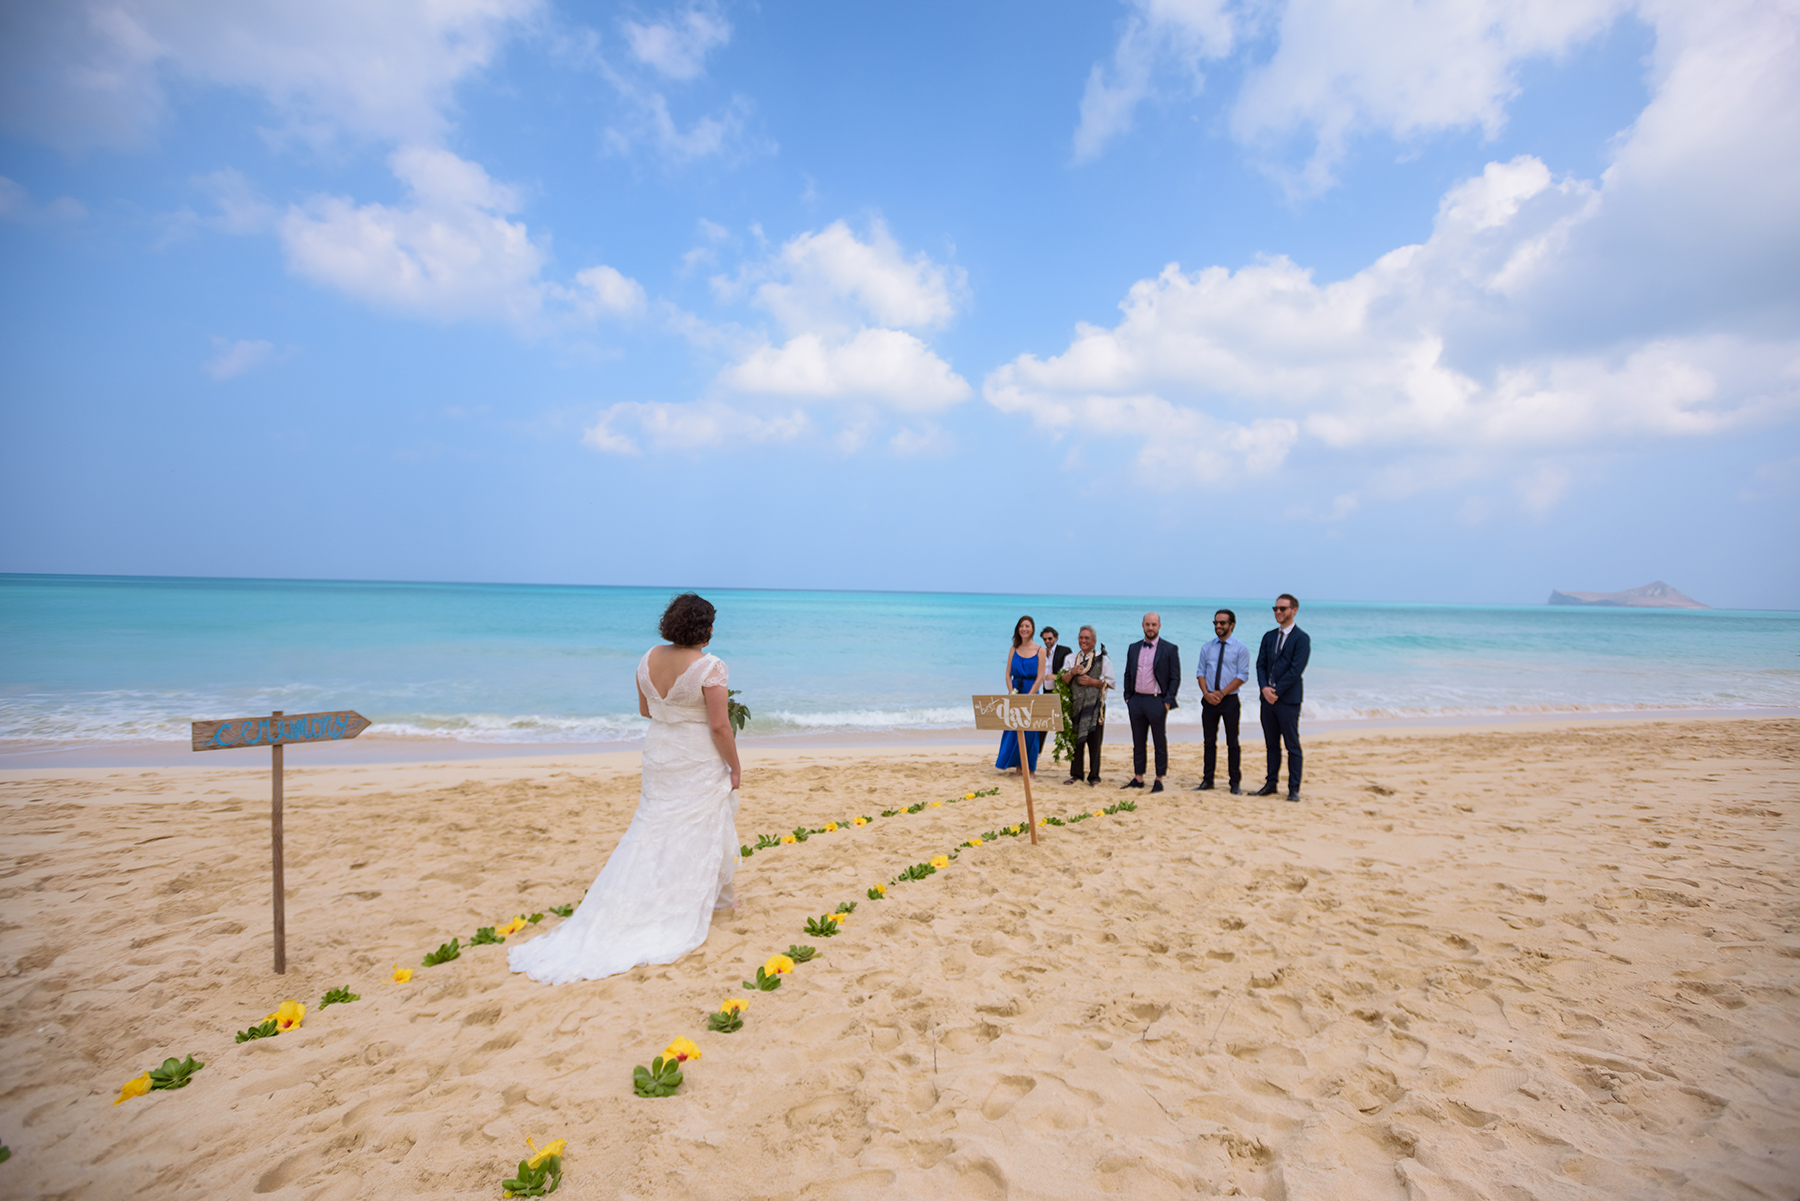 hawaii-beach-ceremony-3.jpg